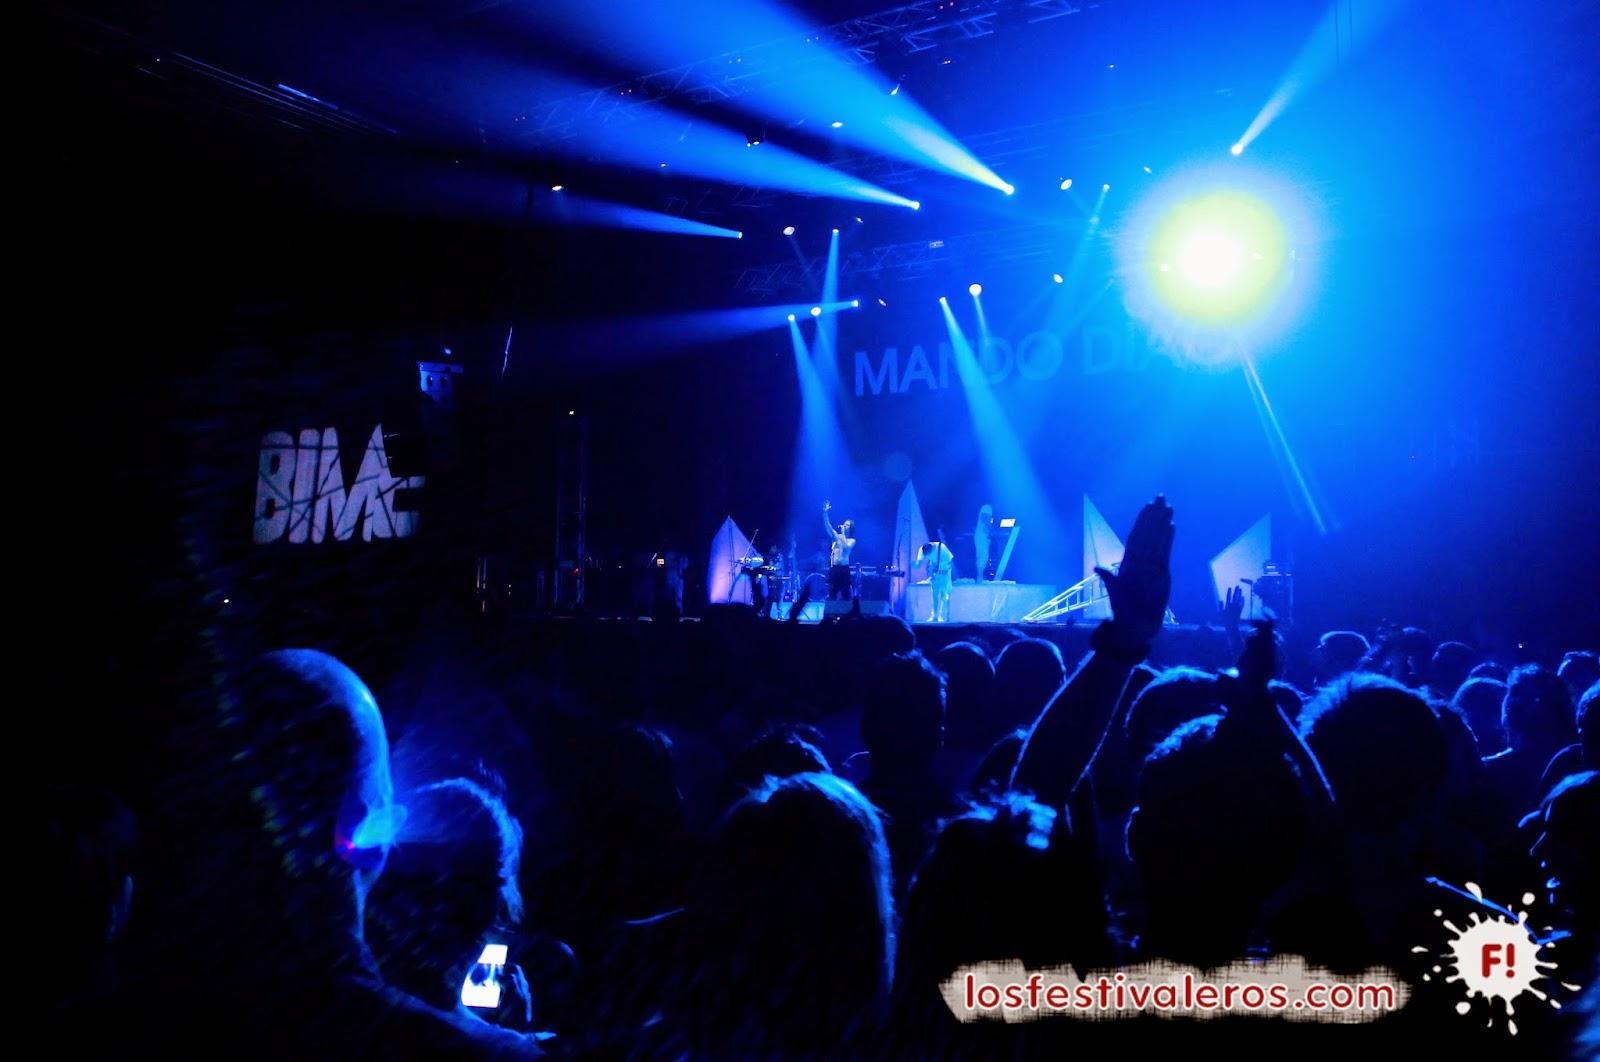 Mando Diao, BIME Live, 2014, Festival, concierto, Bilbao